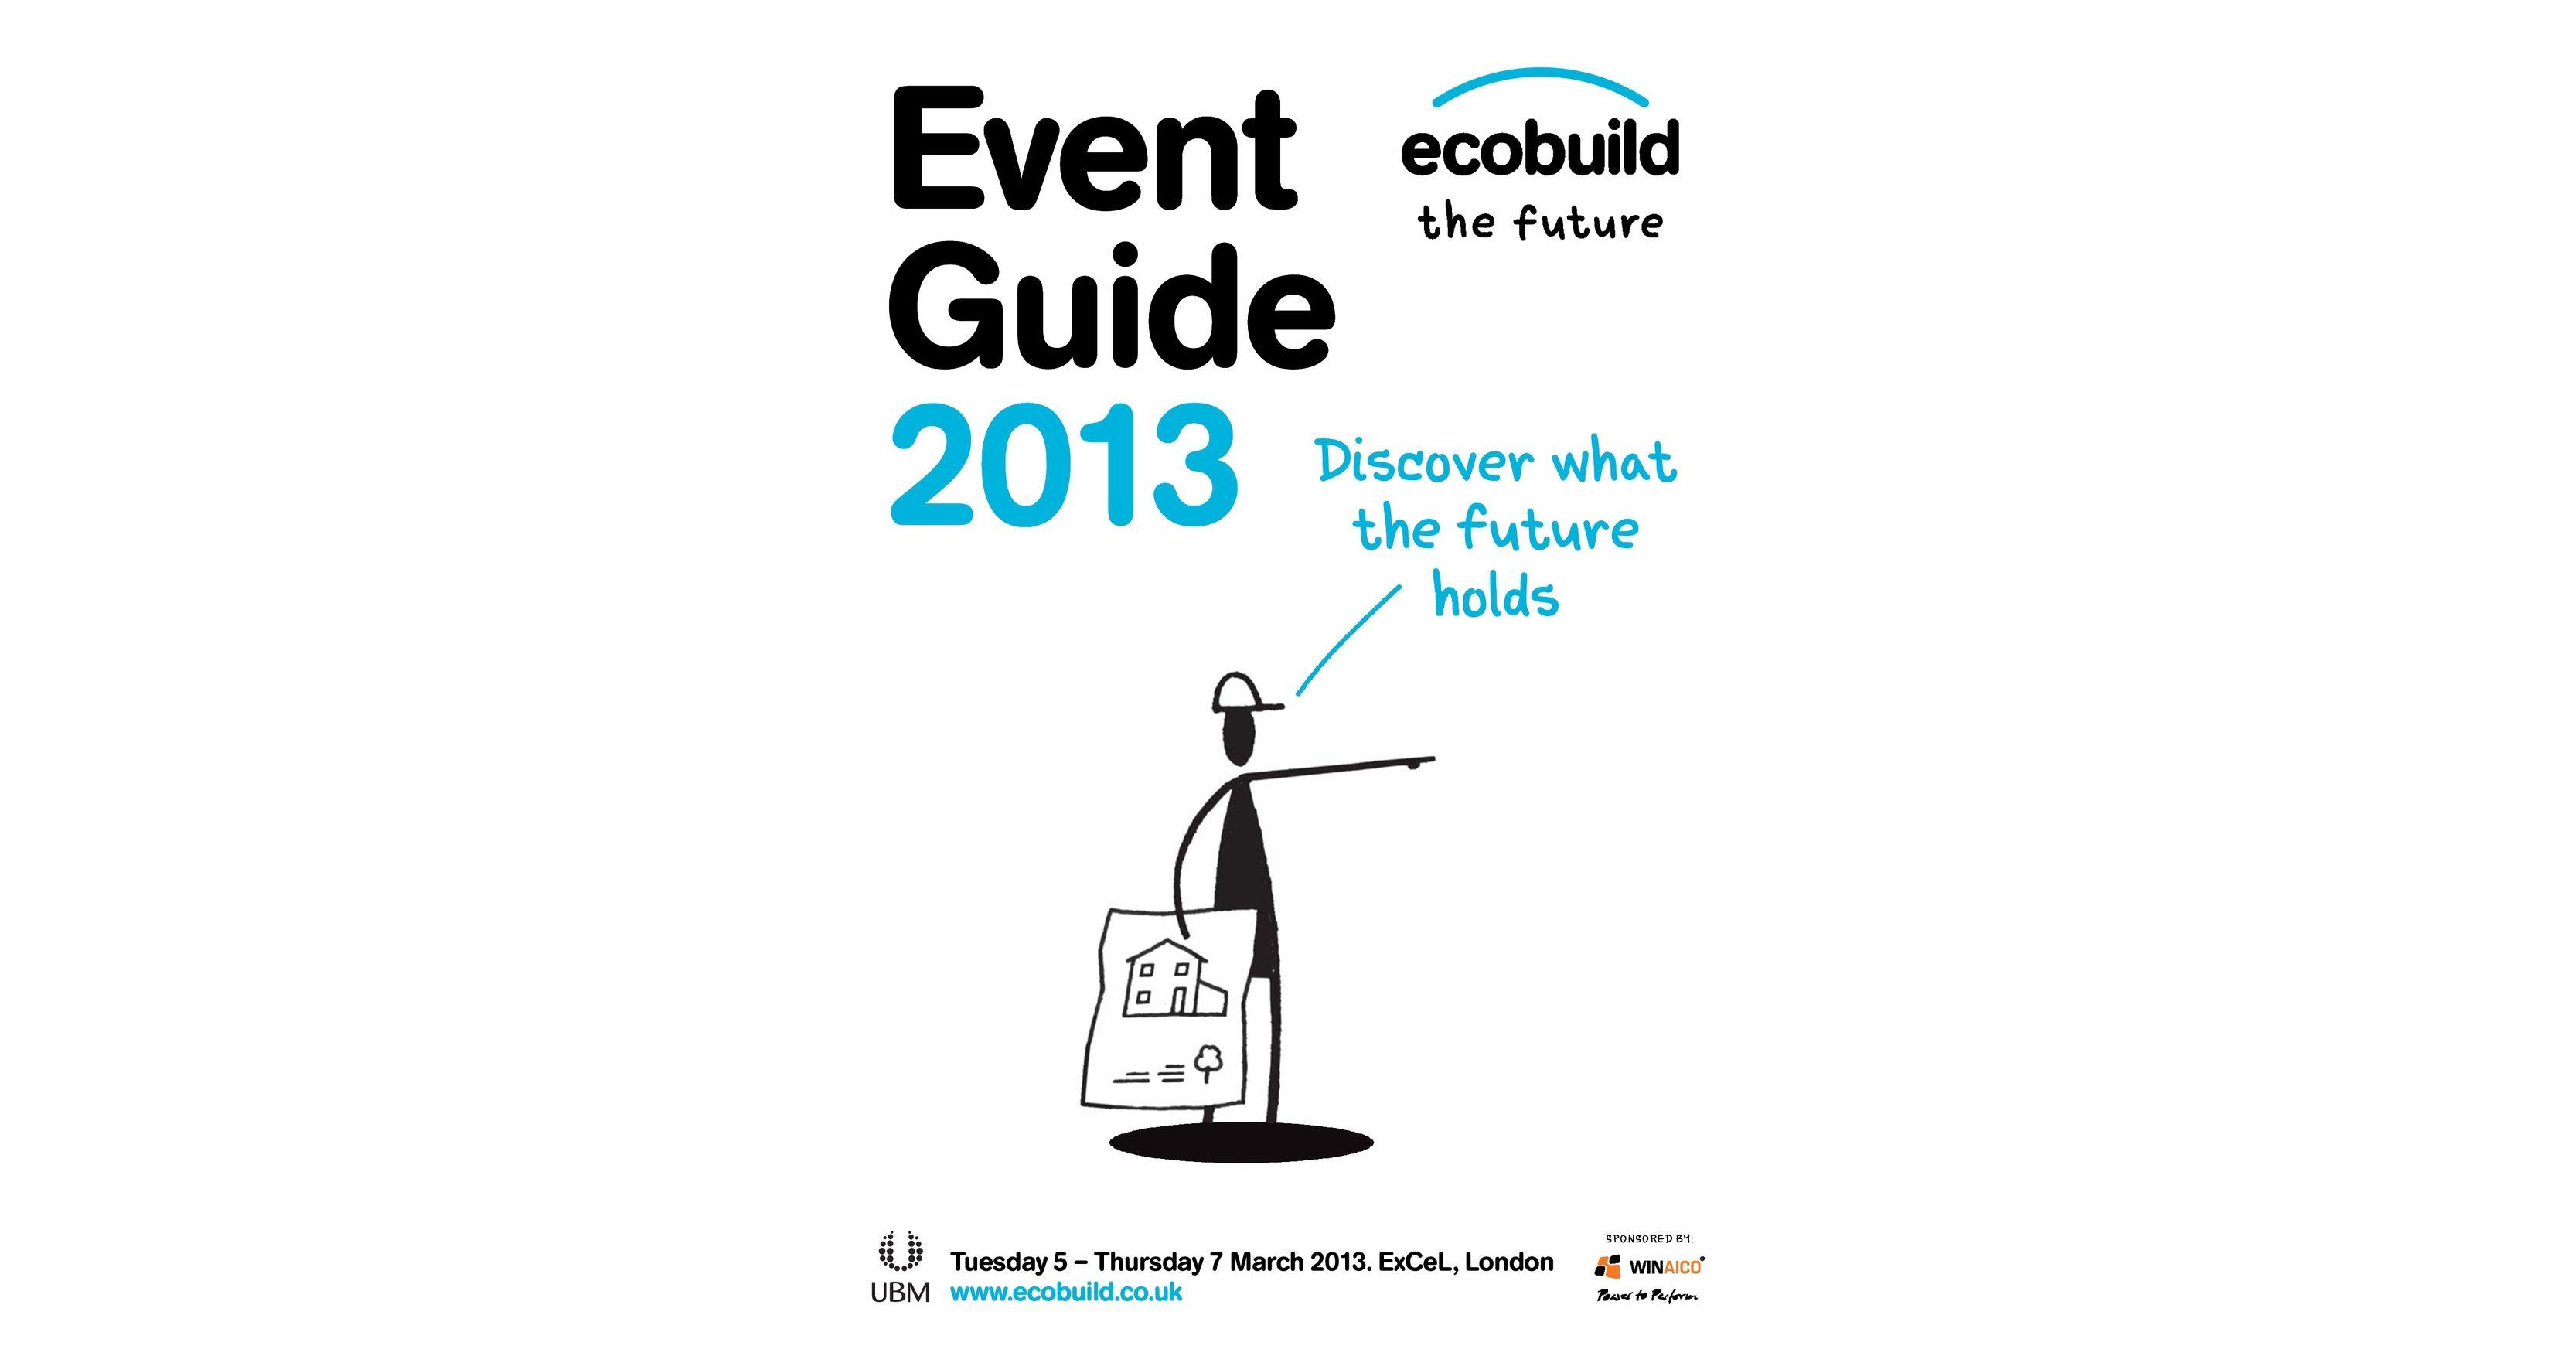 ecobuild matchmaking event